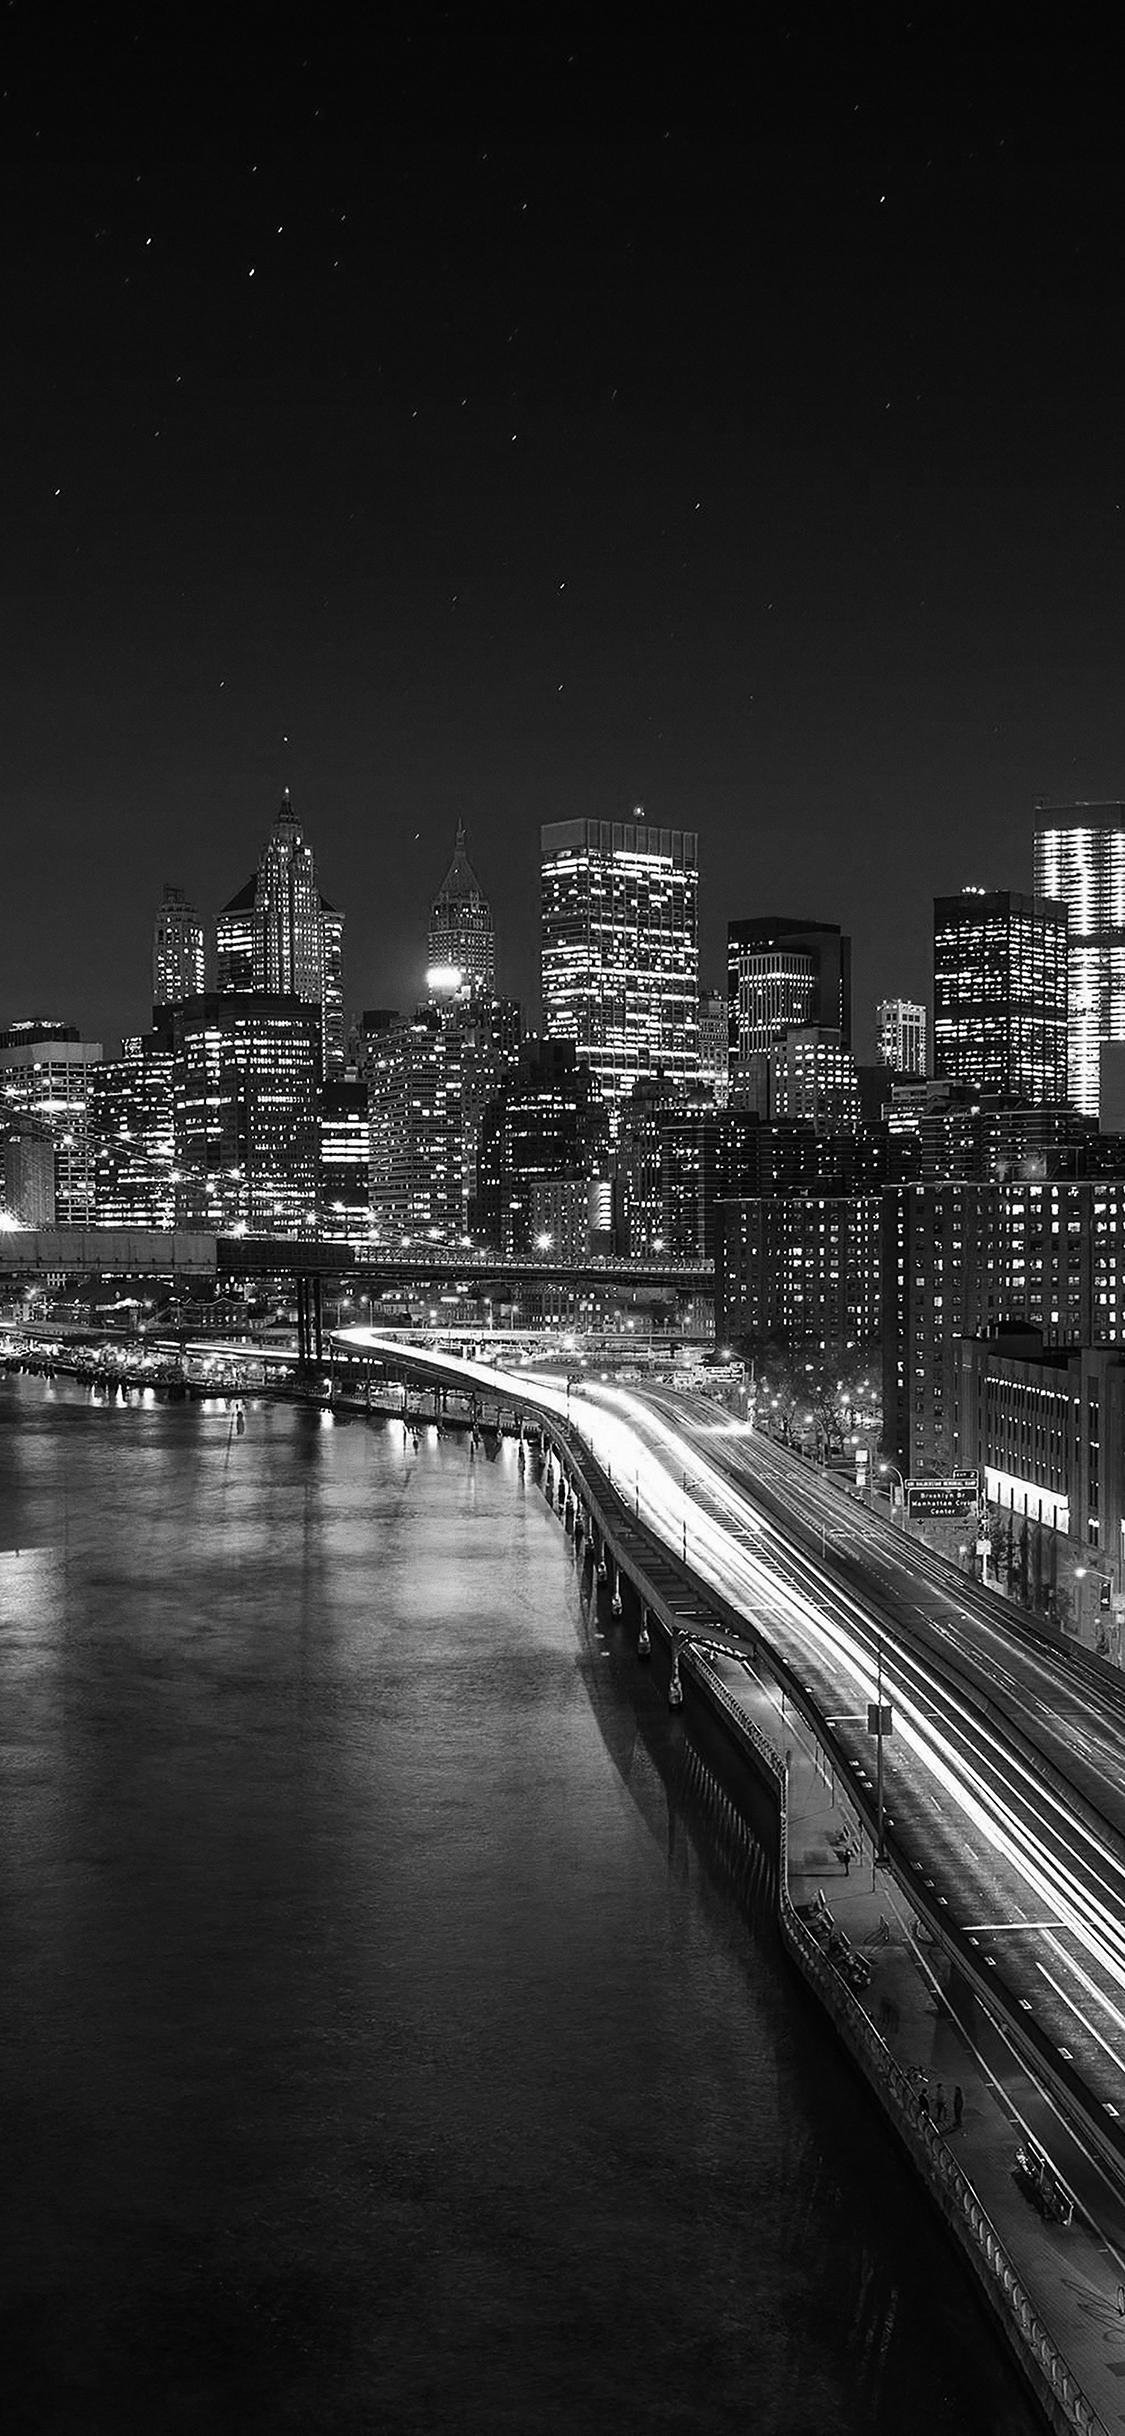 iPhoneXpapers.com-Apple-iPhone-wallpaper-mk04-night-city-view-lights-dark-bridge-nature